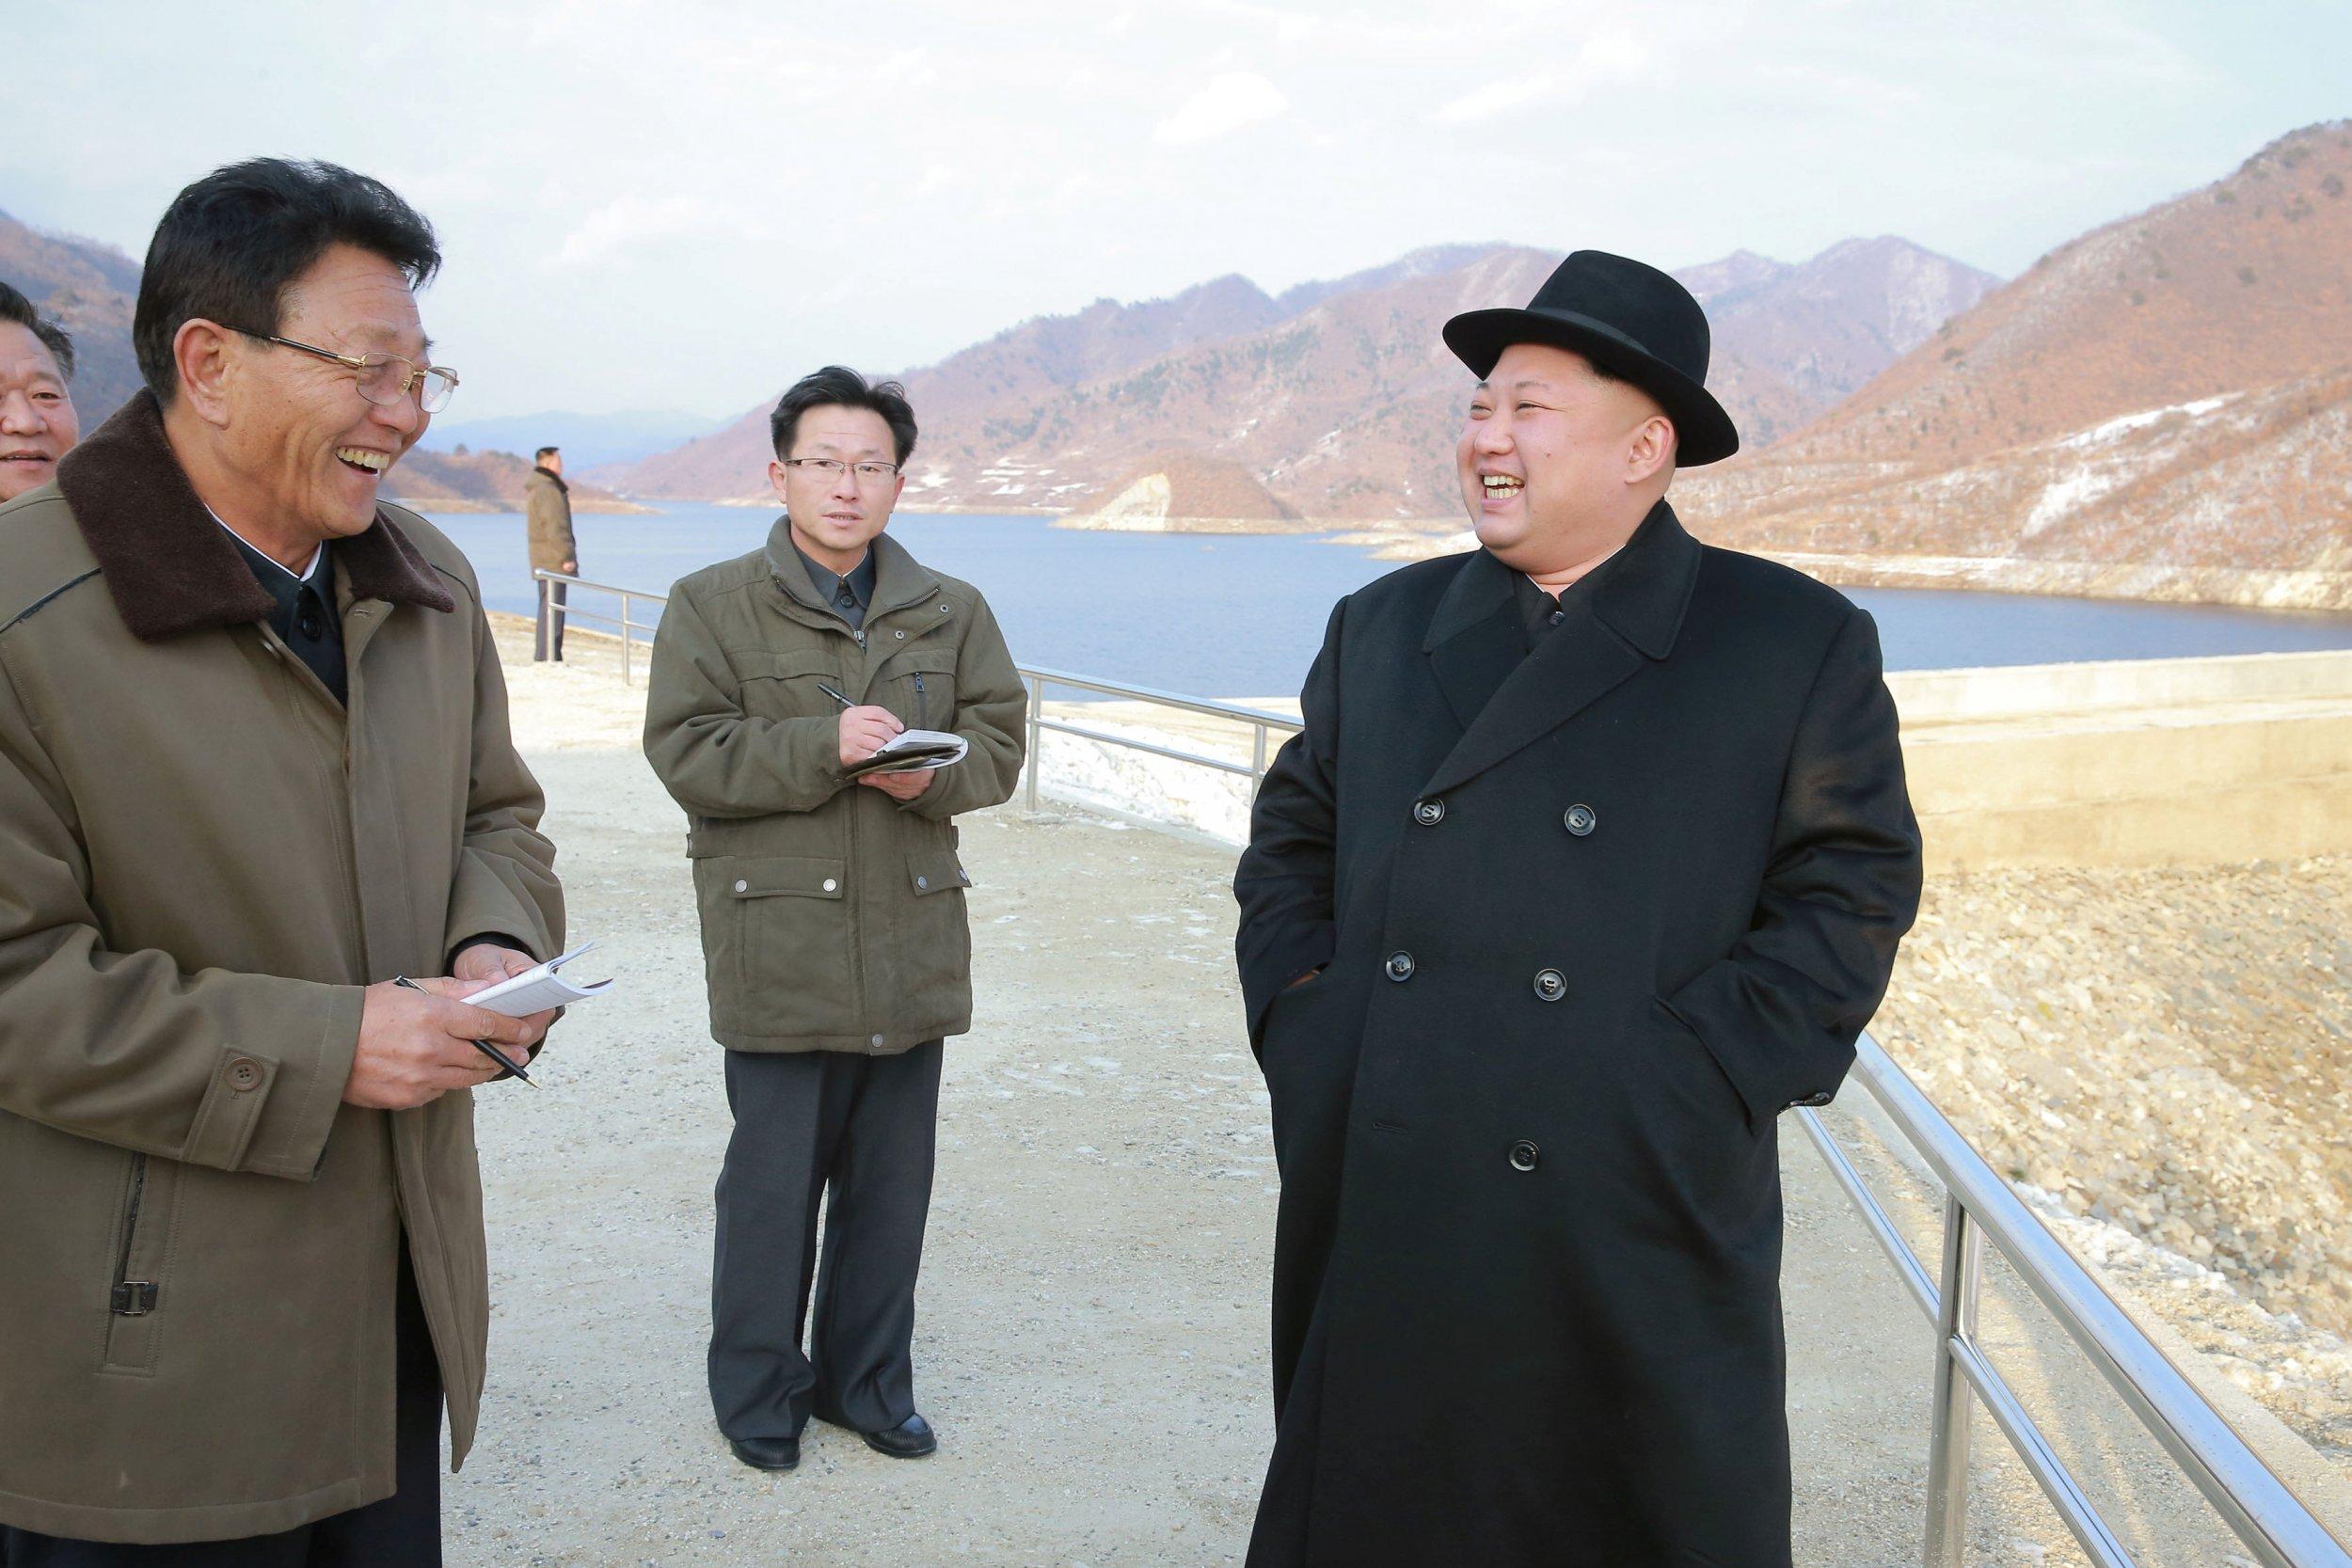 North Korea's leader